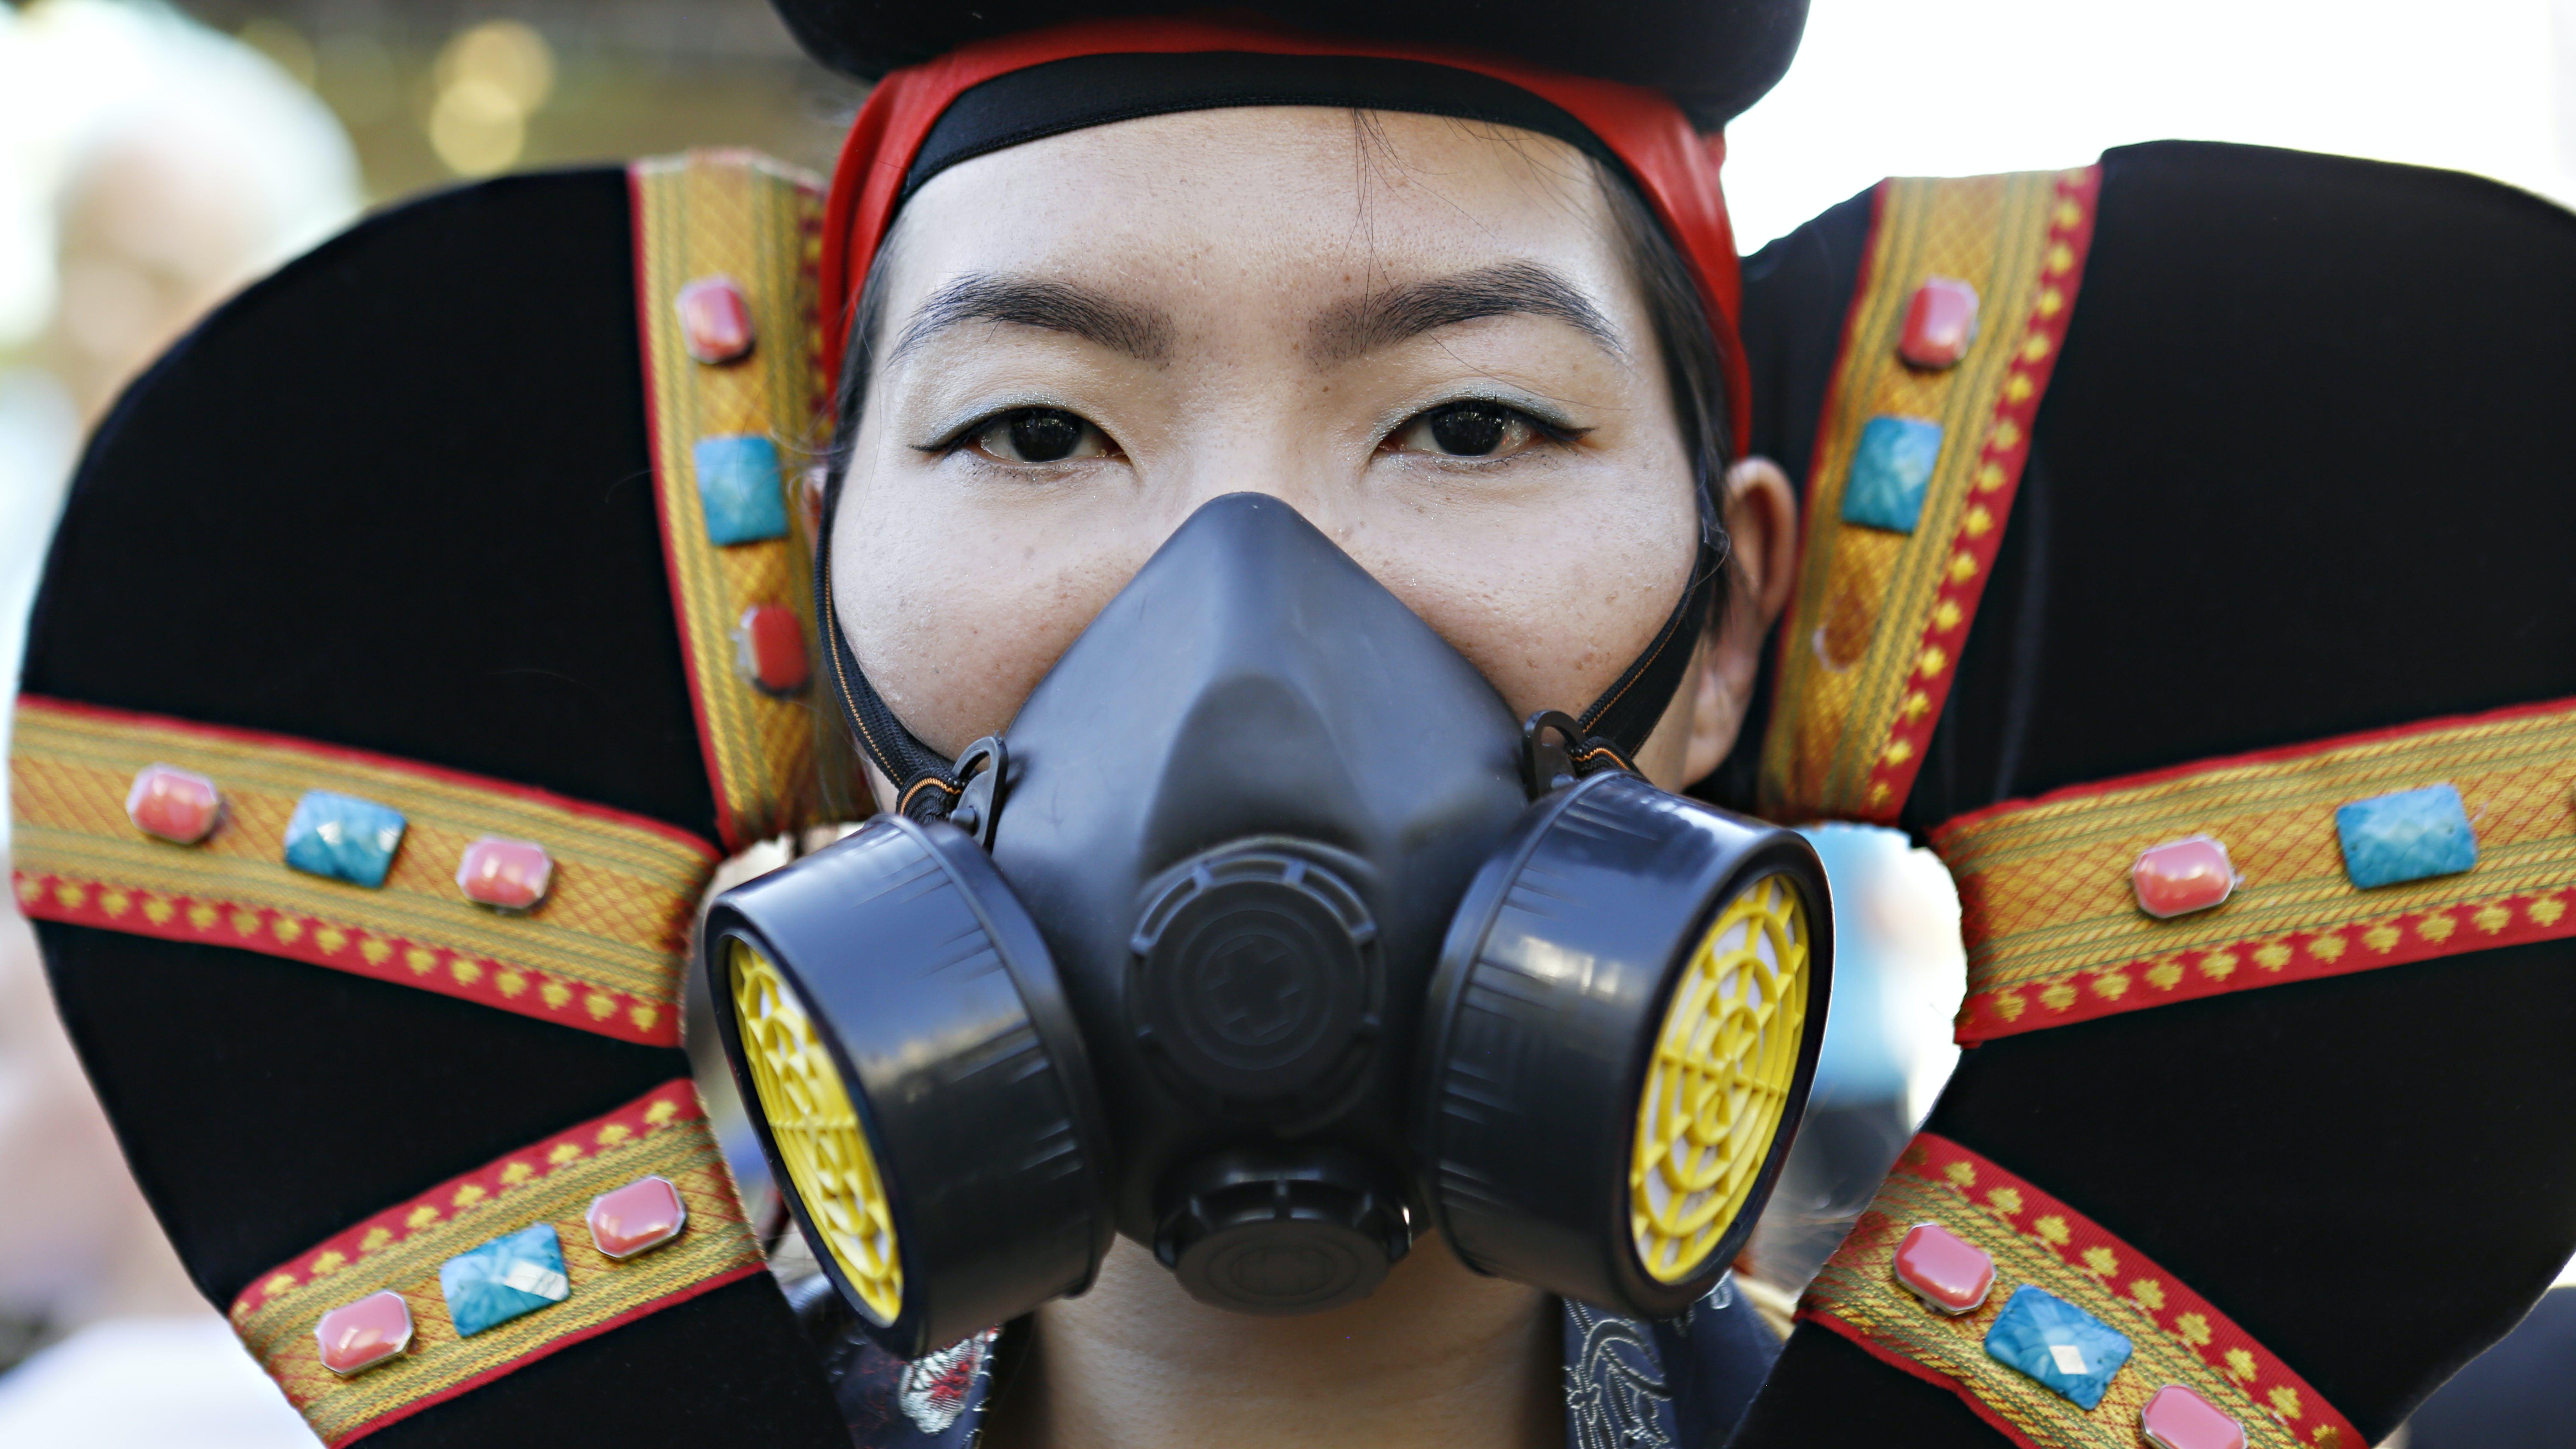 New york, una ragazza indossa una maschera antigas durante una manifestazione.